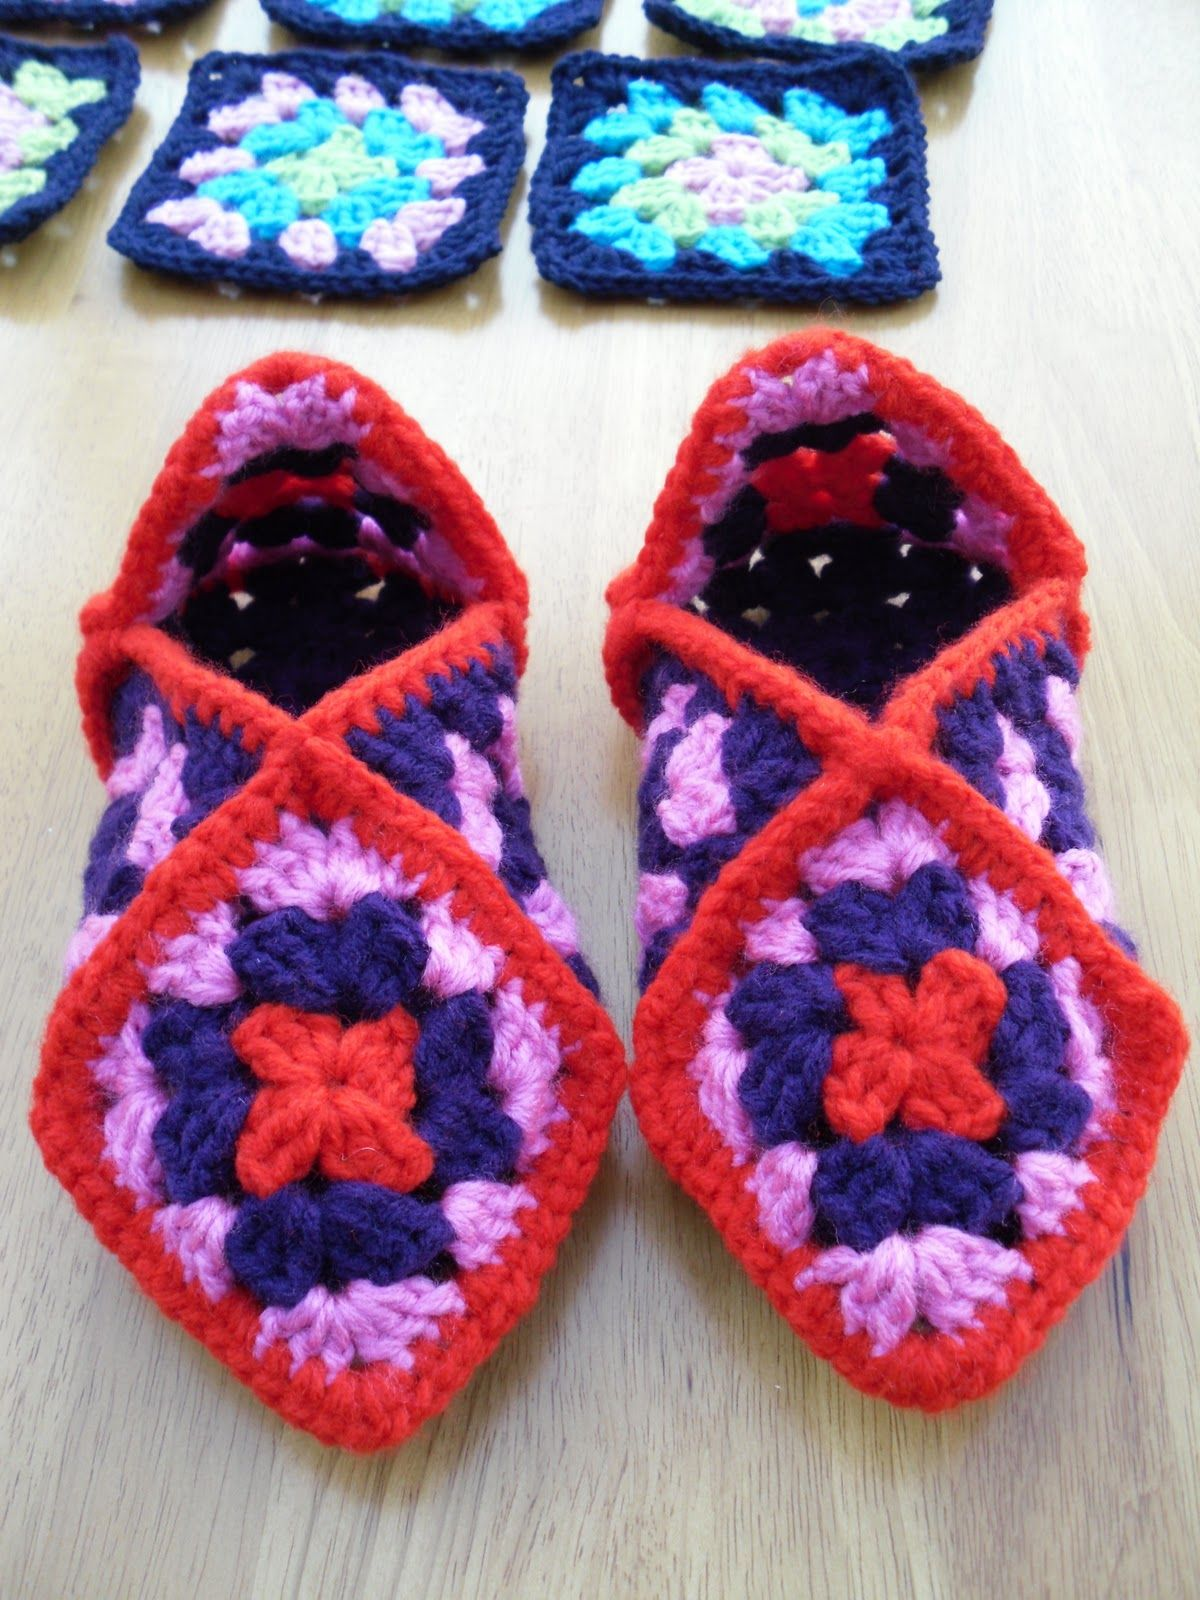 How to Crochet Granny Squares | Kopf, Hände und Häkeln